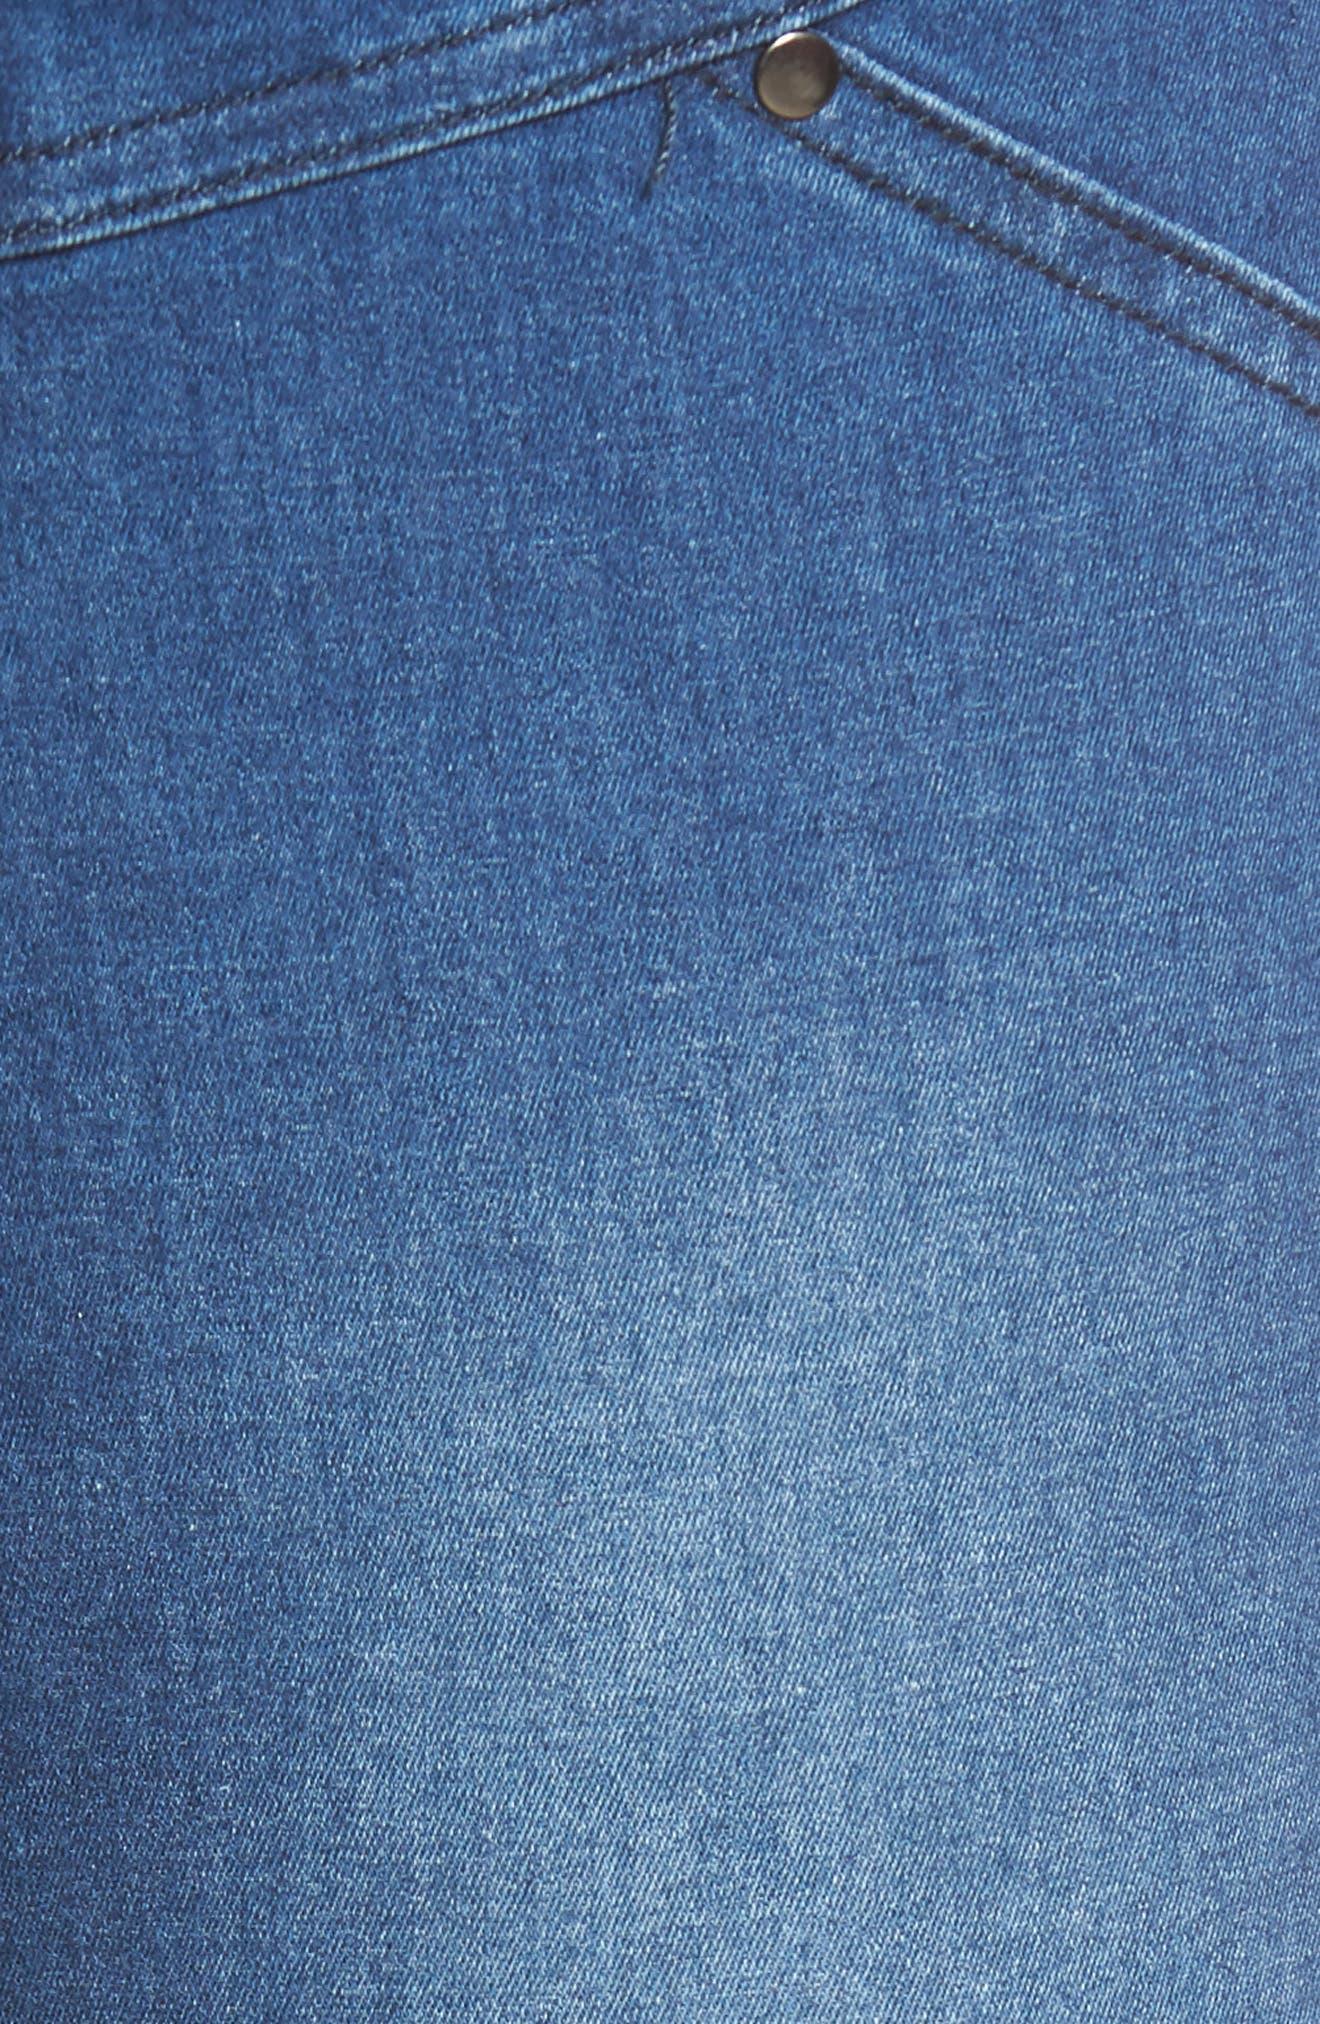 Bleached Raw Hem Denim Skimmer Leggings,                             Alternate thumbnail 5, color,                             Medium Wash